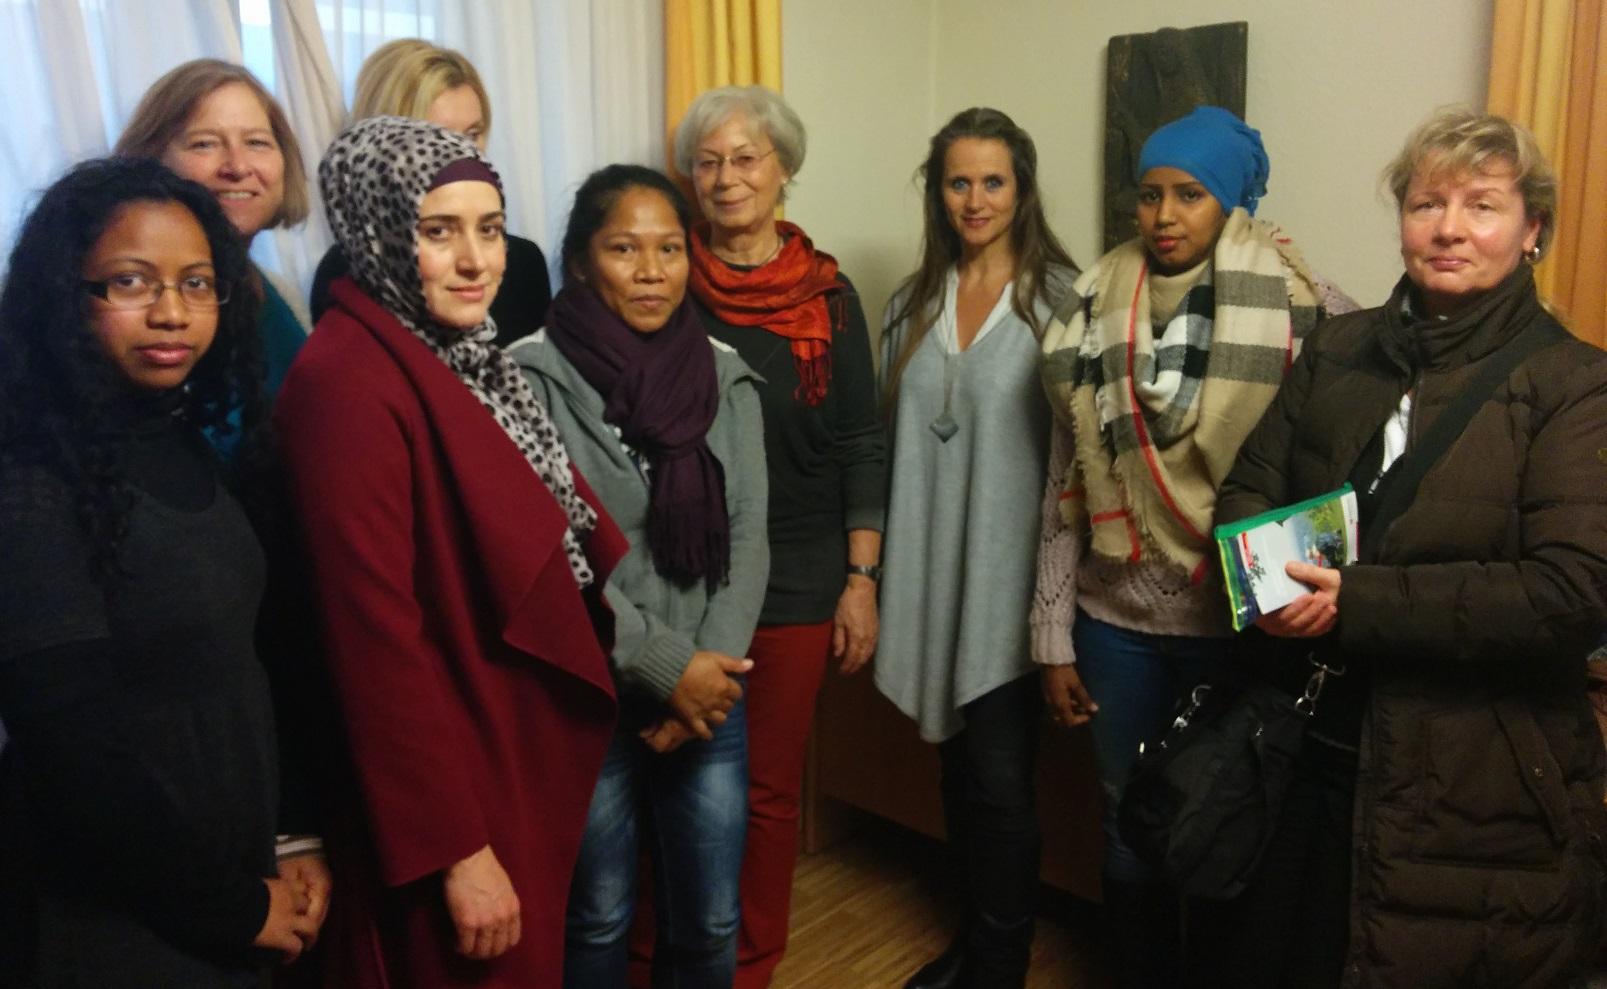 Altenpflegeschule trifft Malteser Hospiz